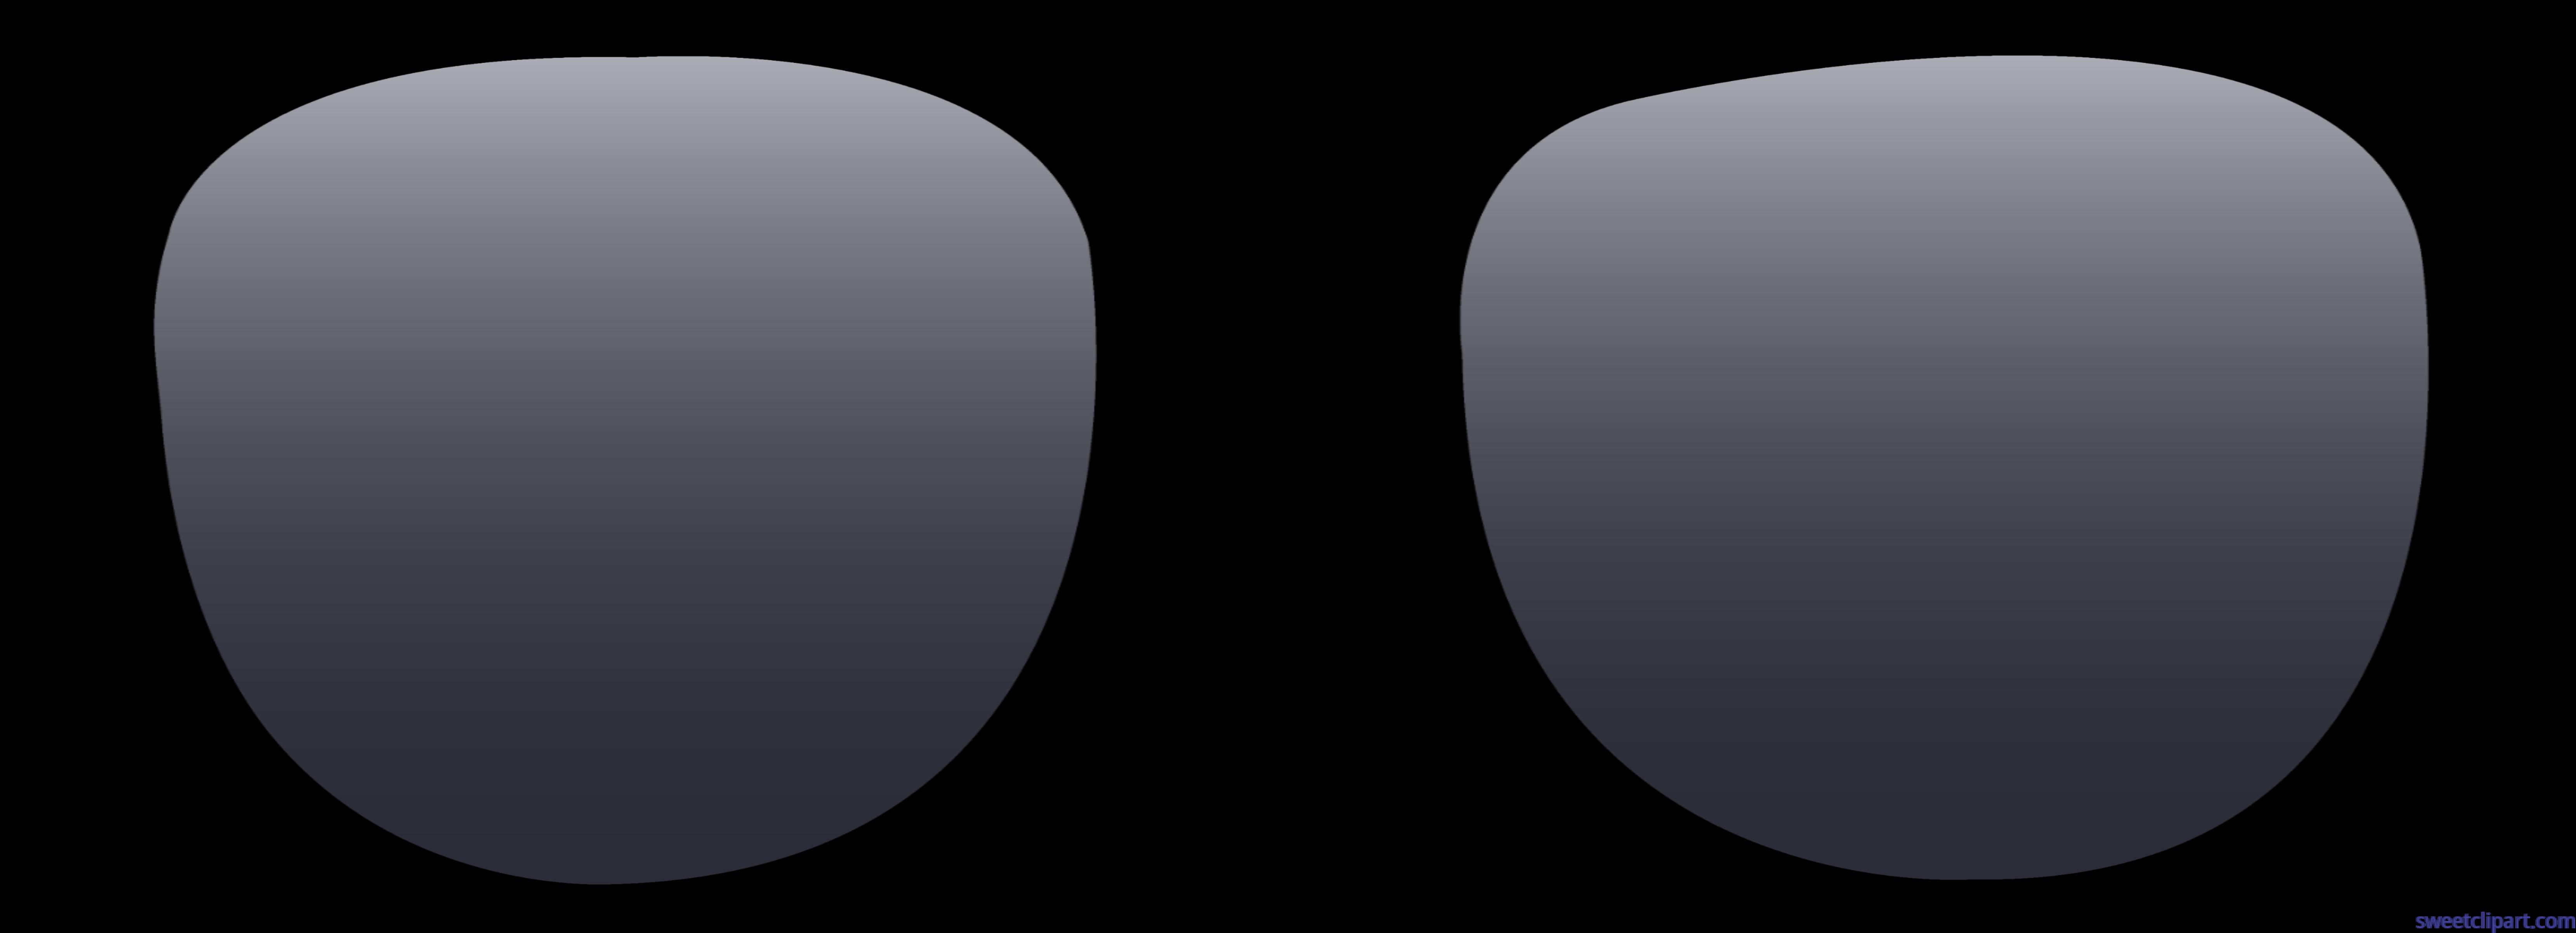 Clipart sunglasses line art. Black clip sweet